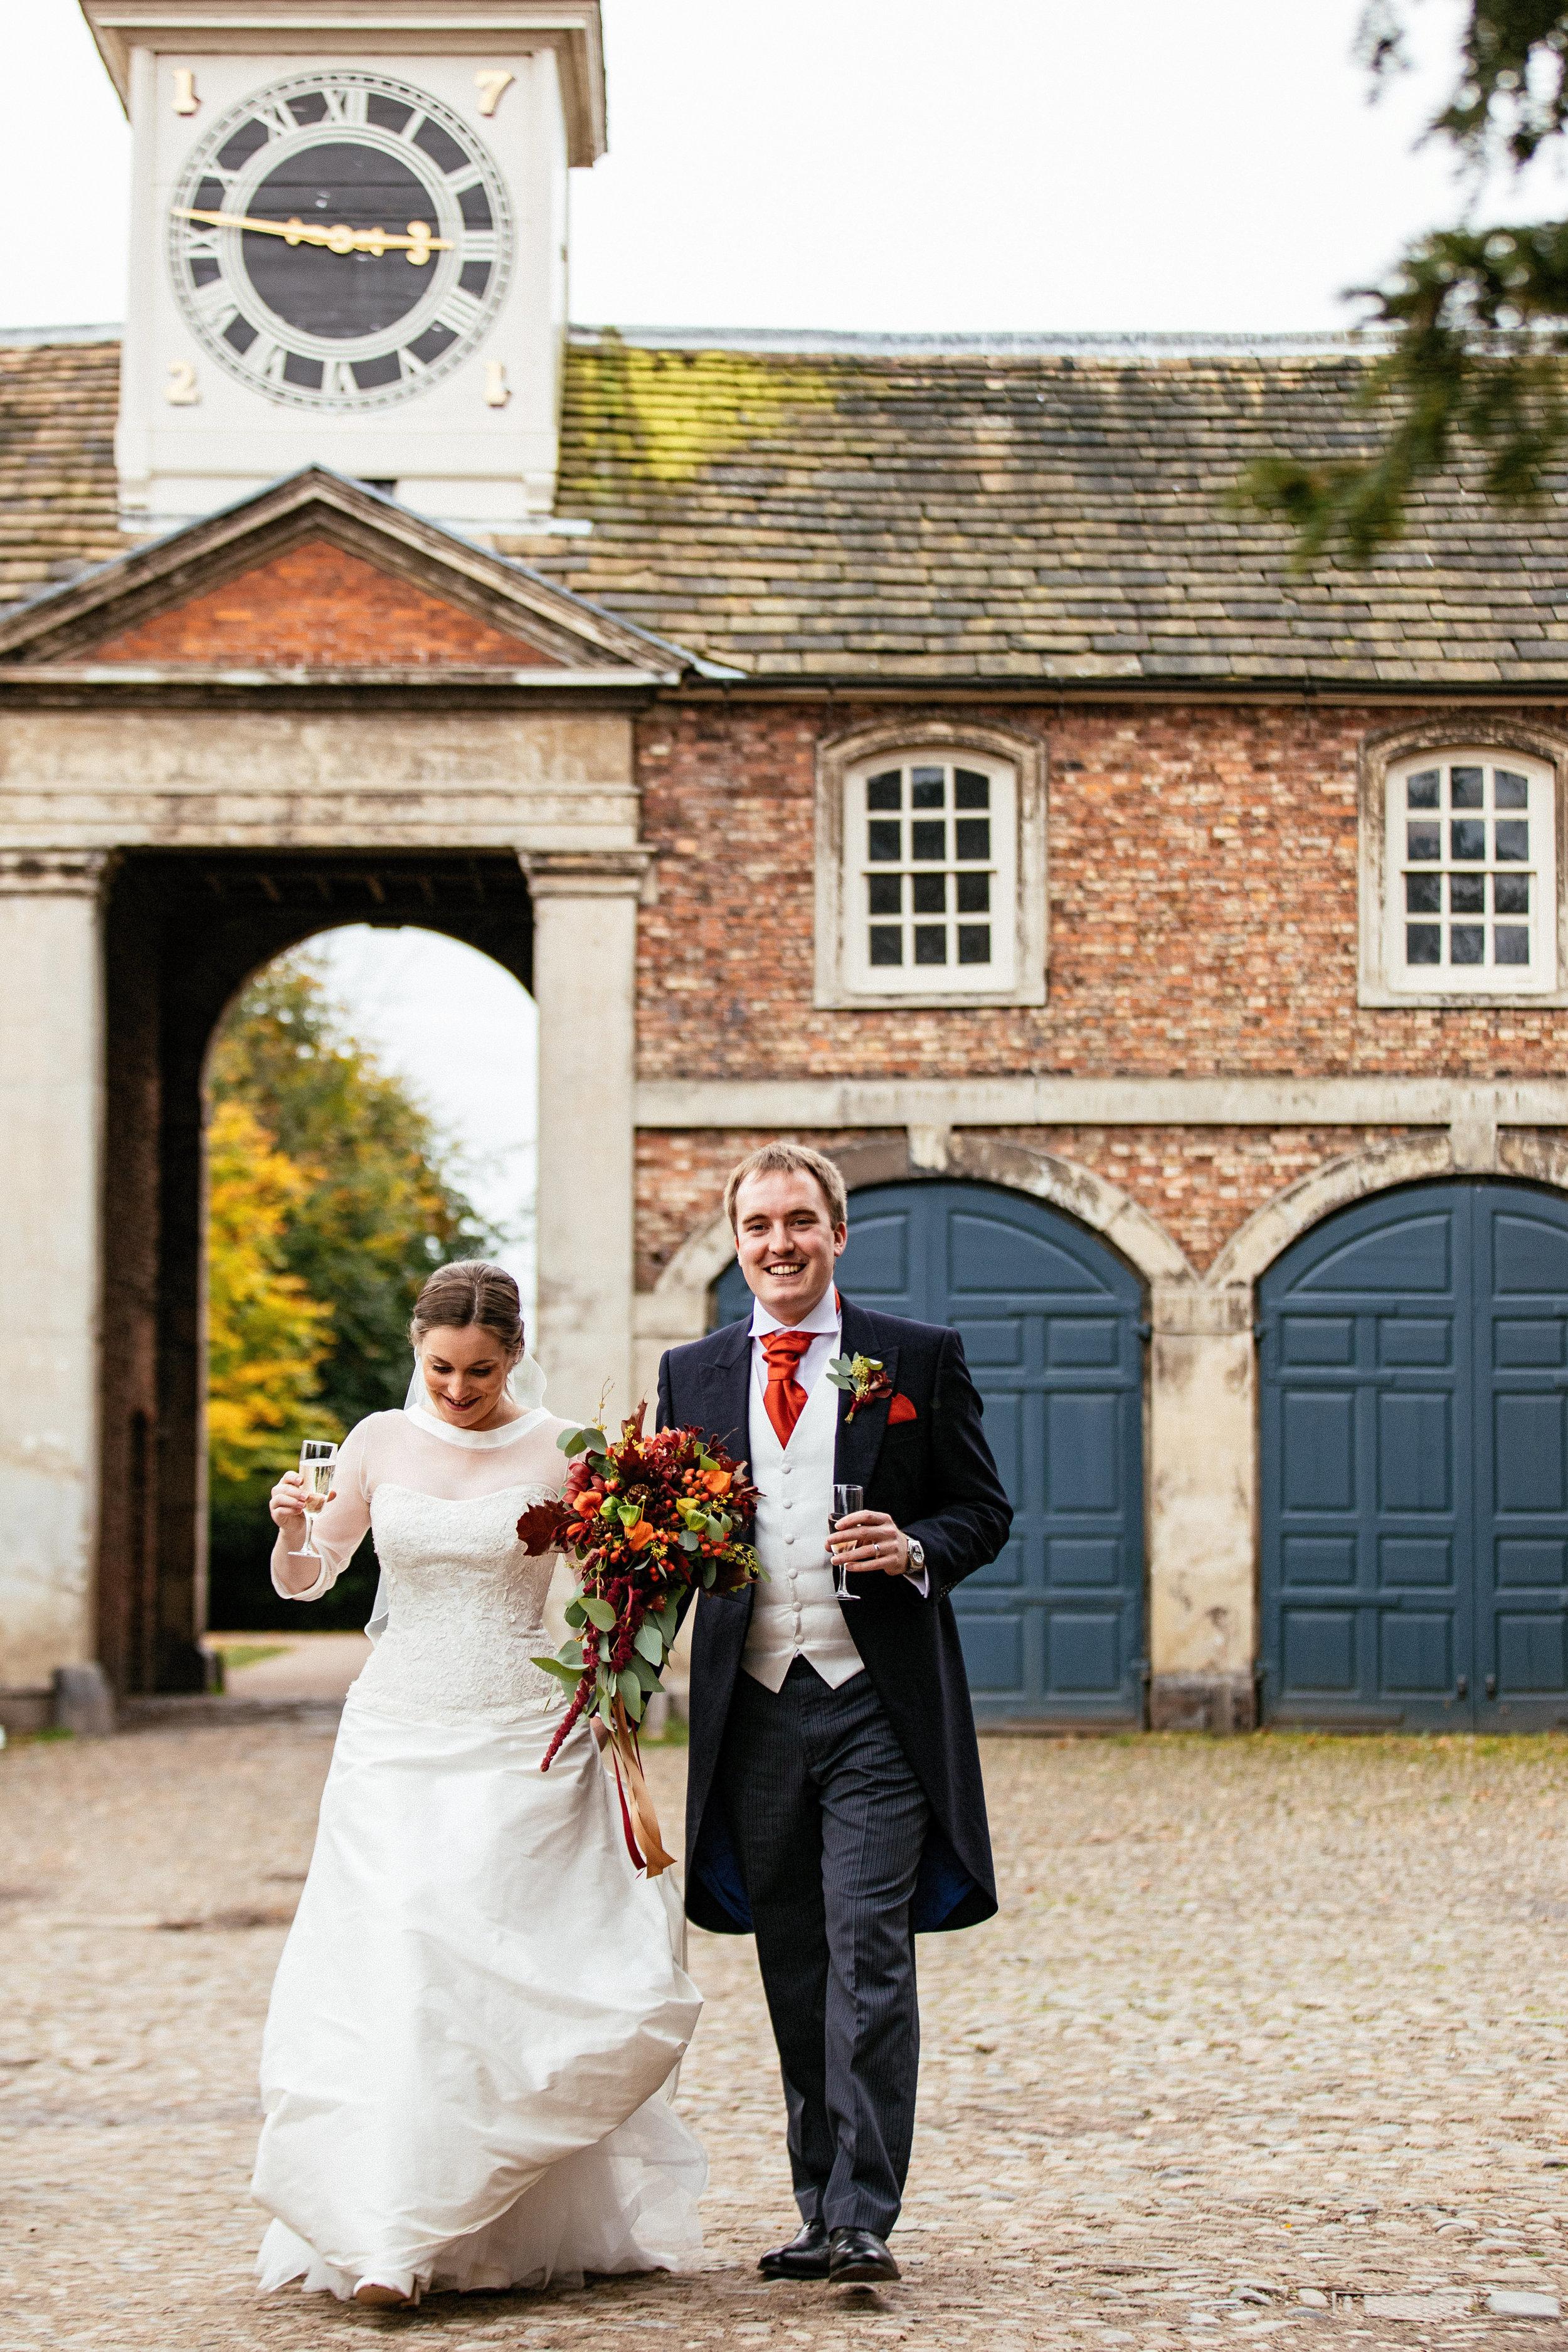 Dunham-Massey-Wedding-Photographer-37.jpg